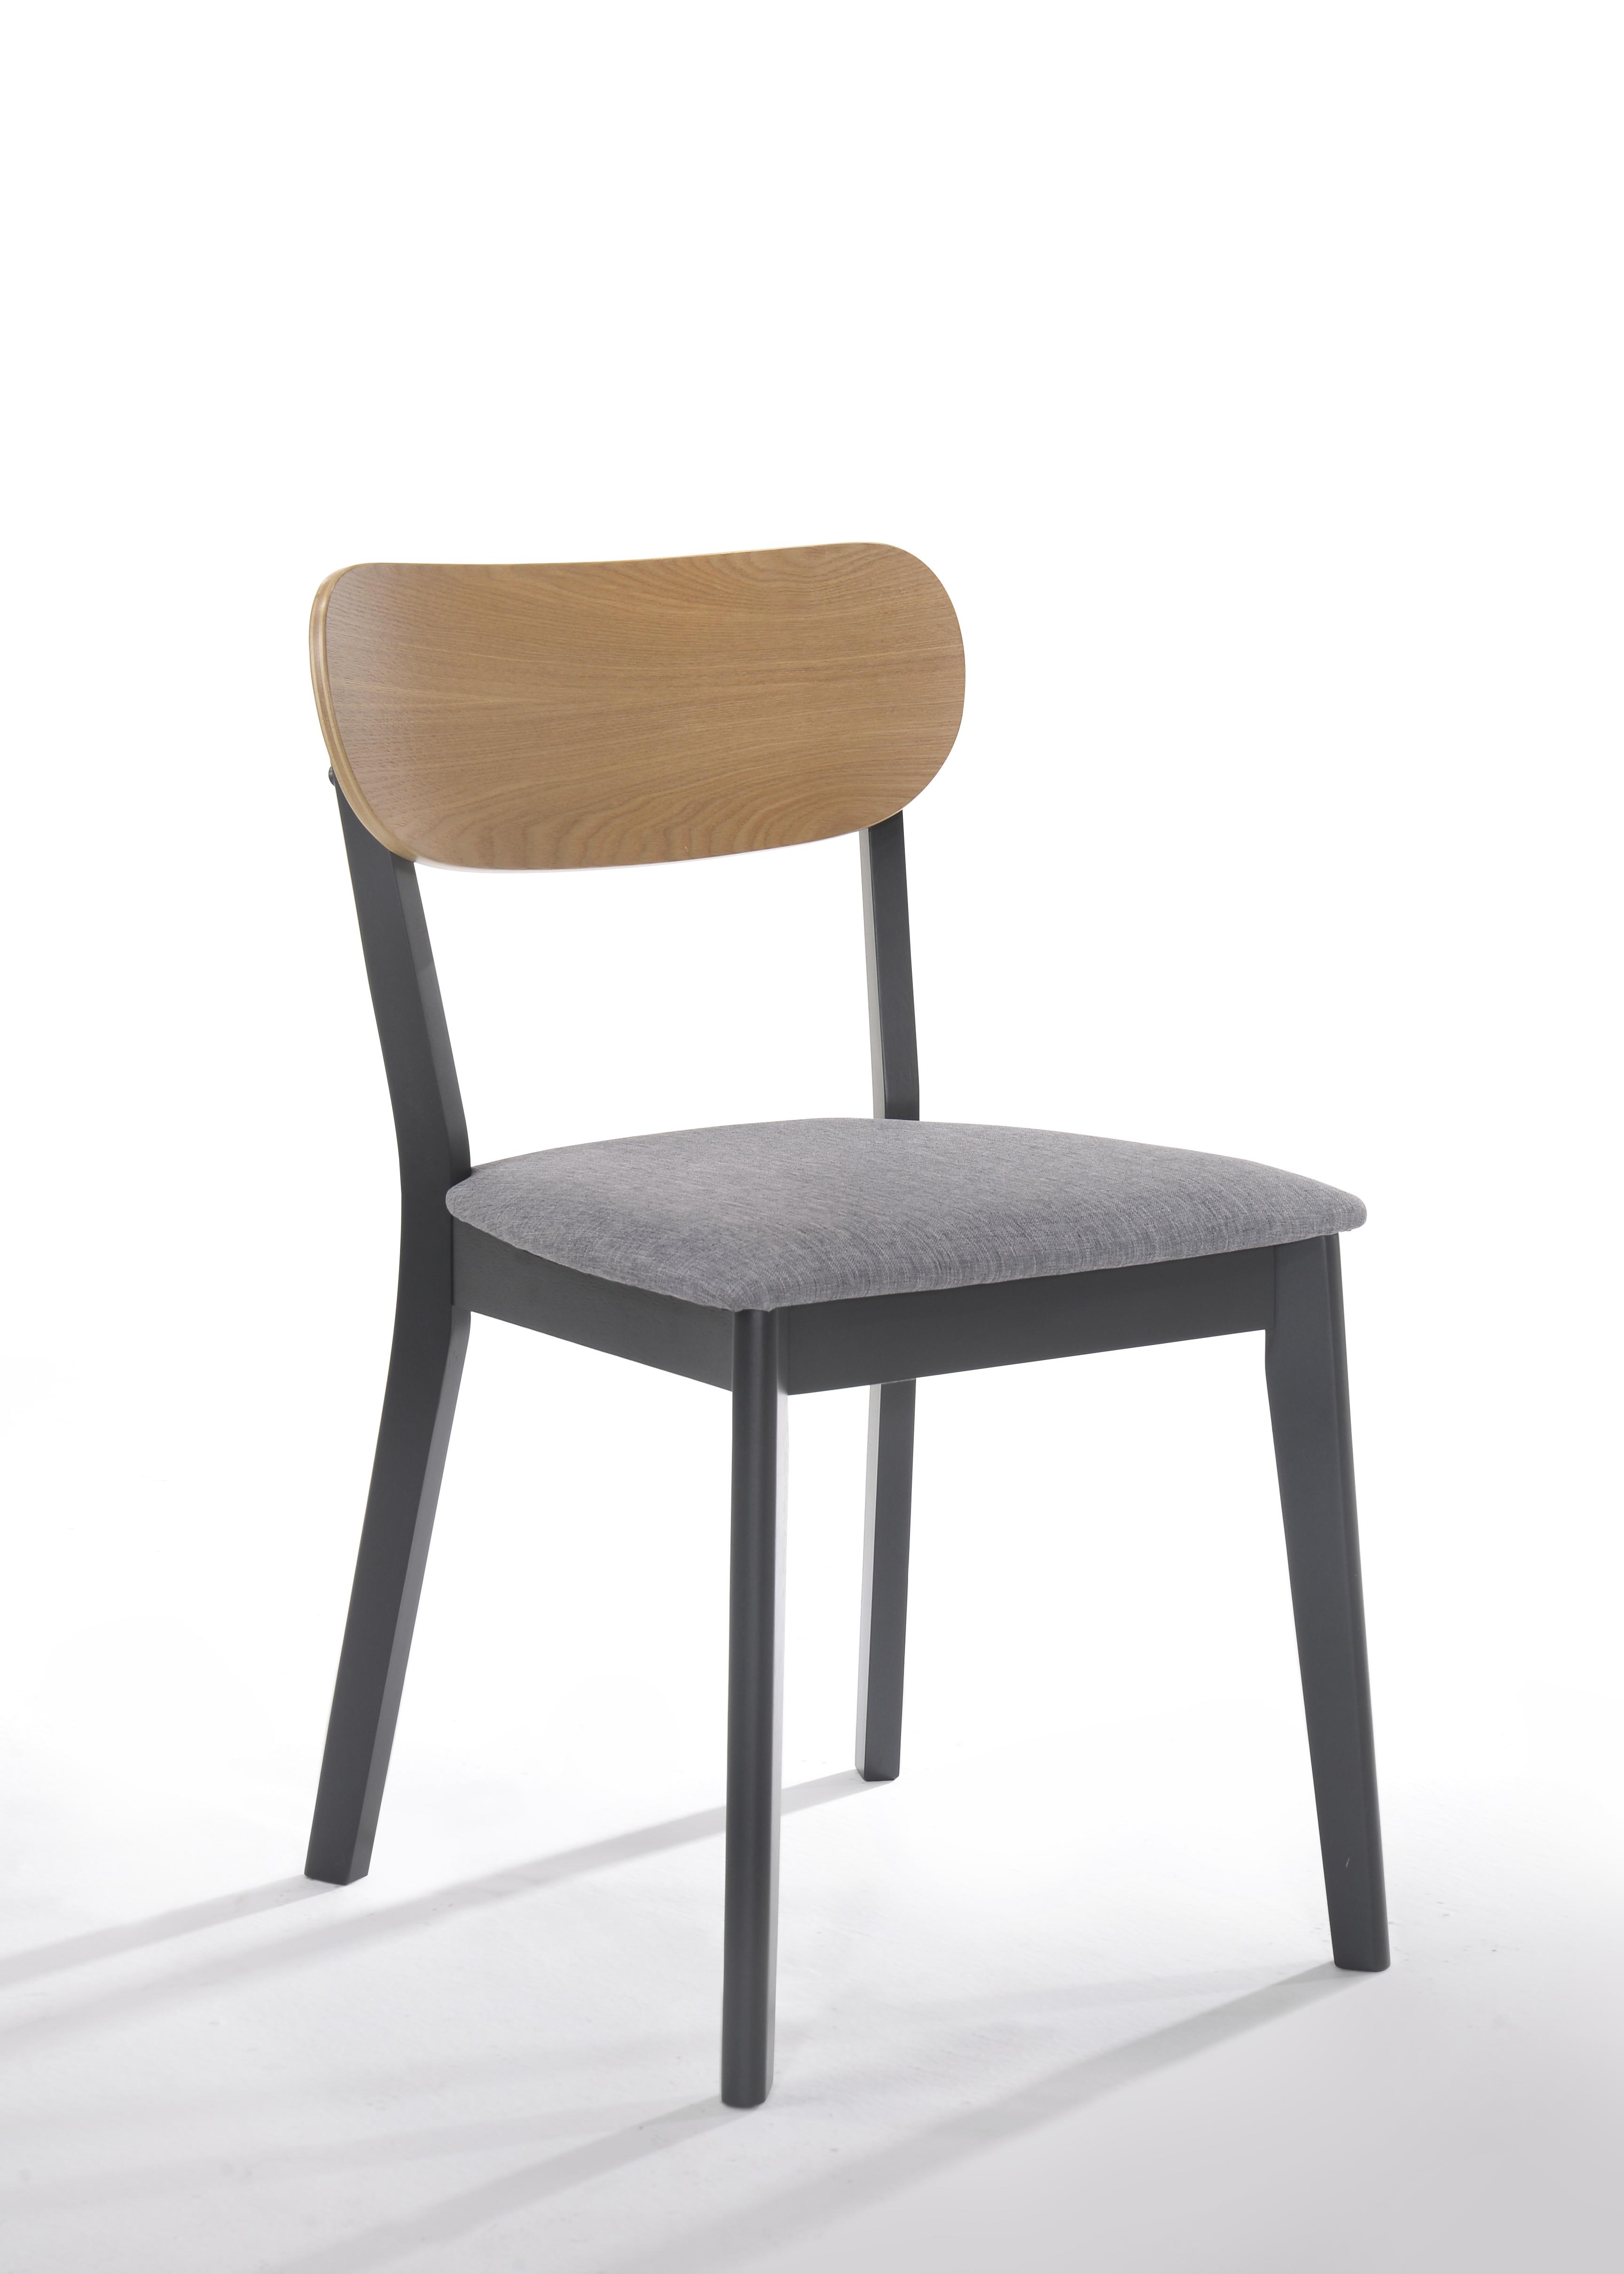 Mobiliya design - Stul -  Mİ-784  - 1